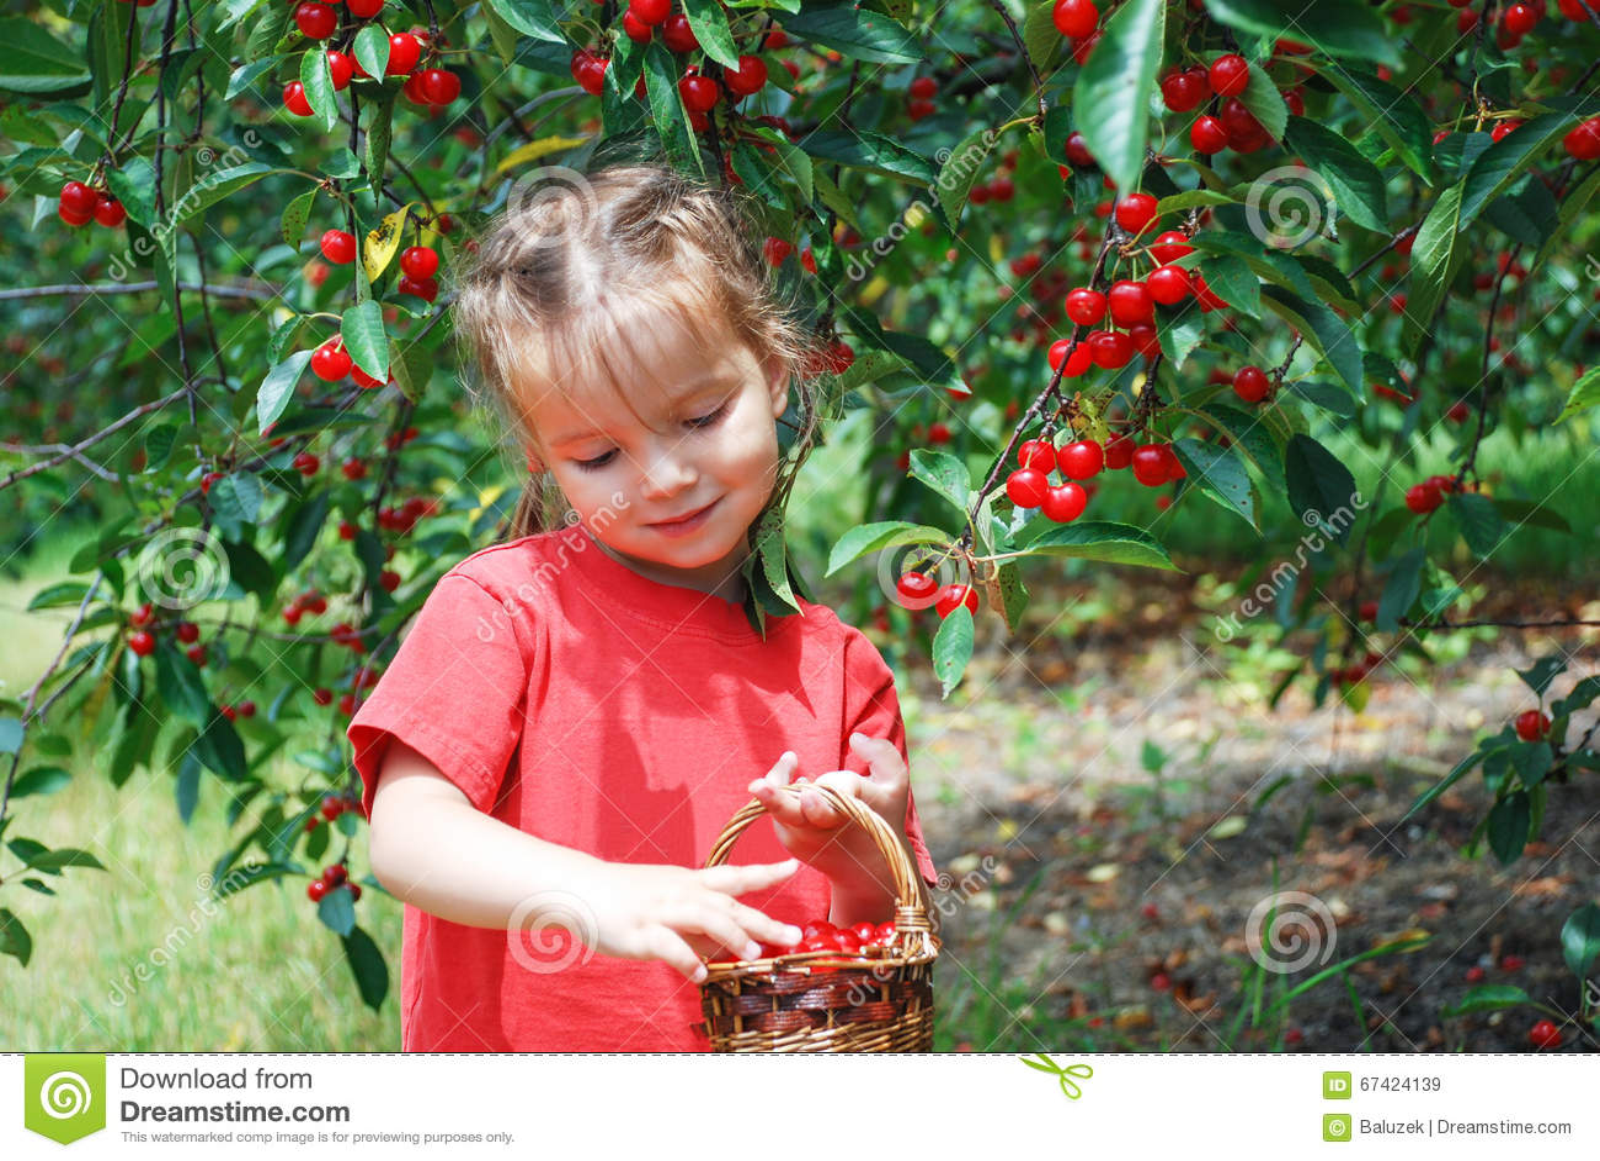 Une petite fille timide dans le jardin de cerise